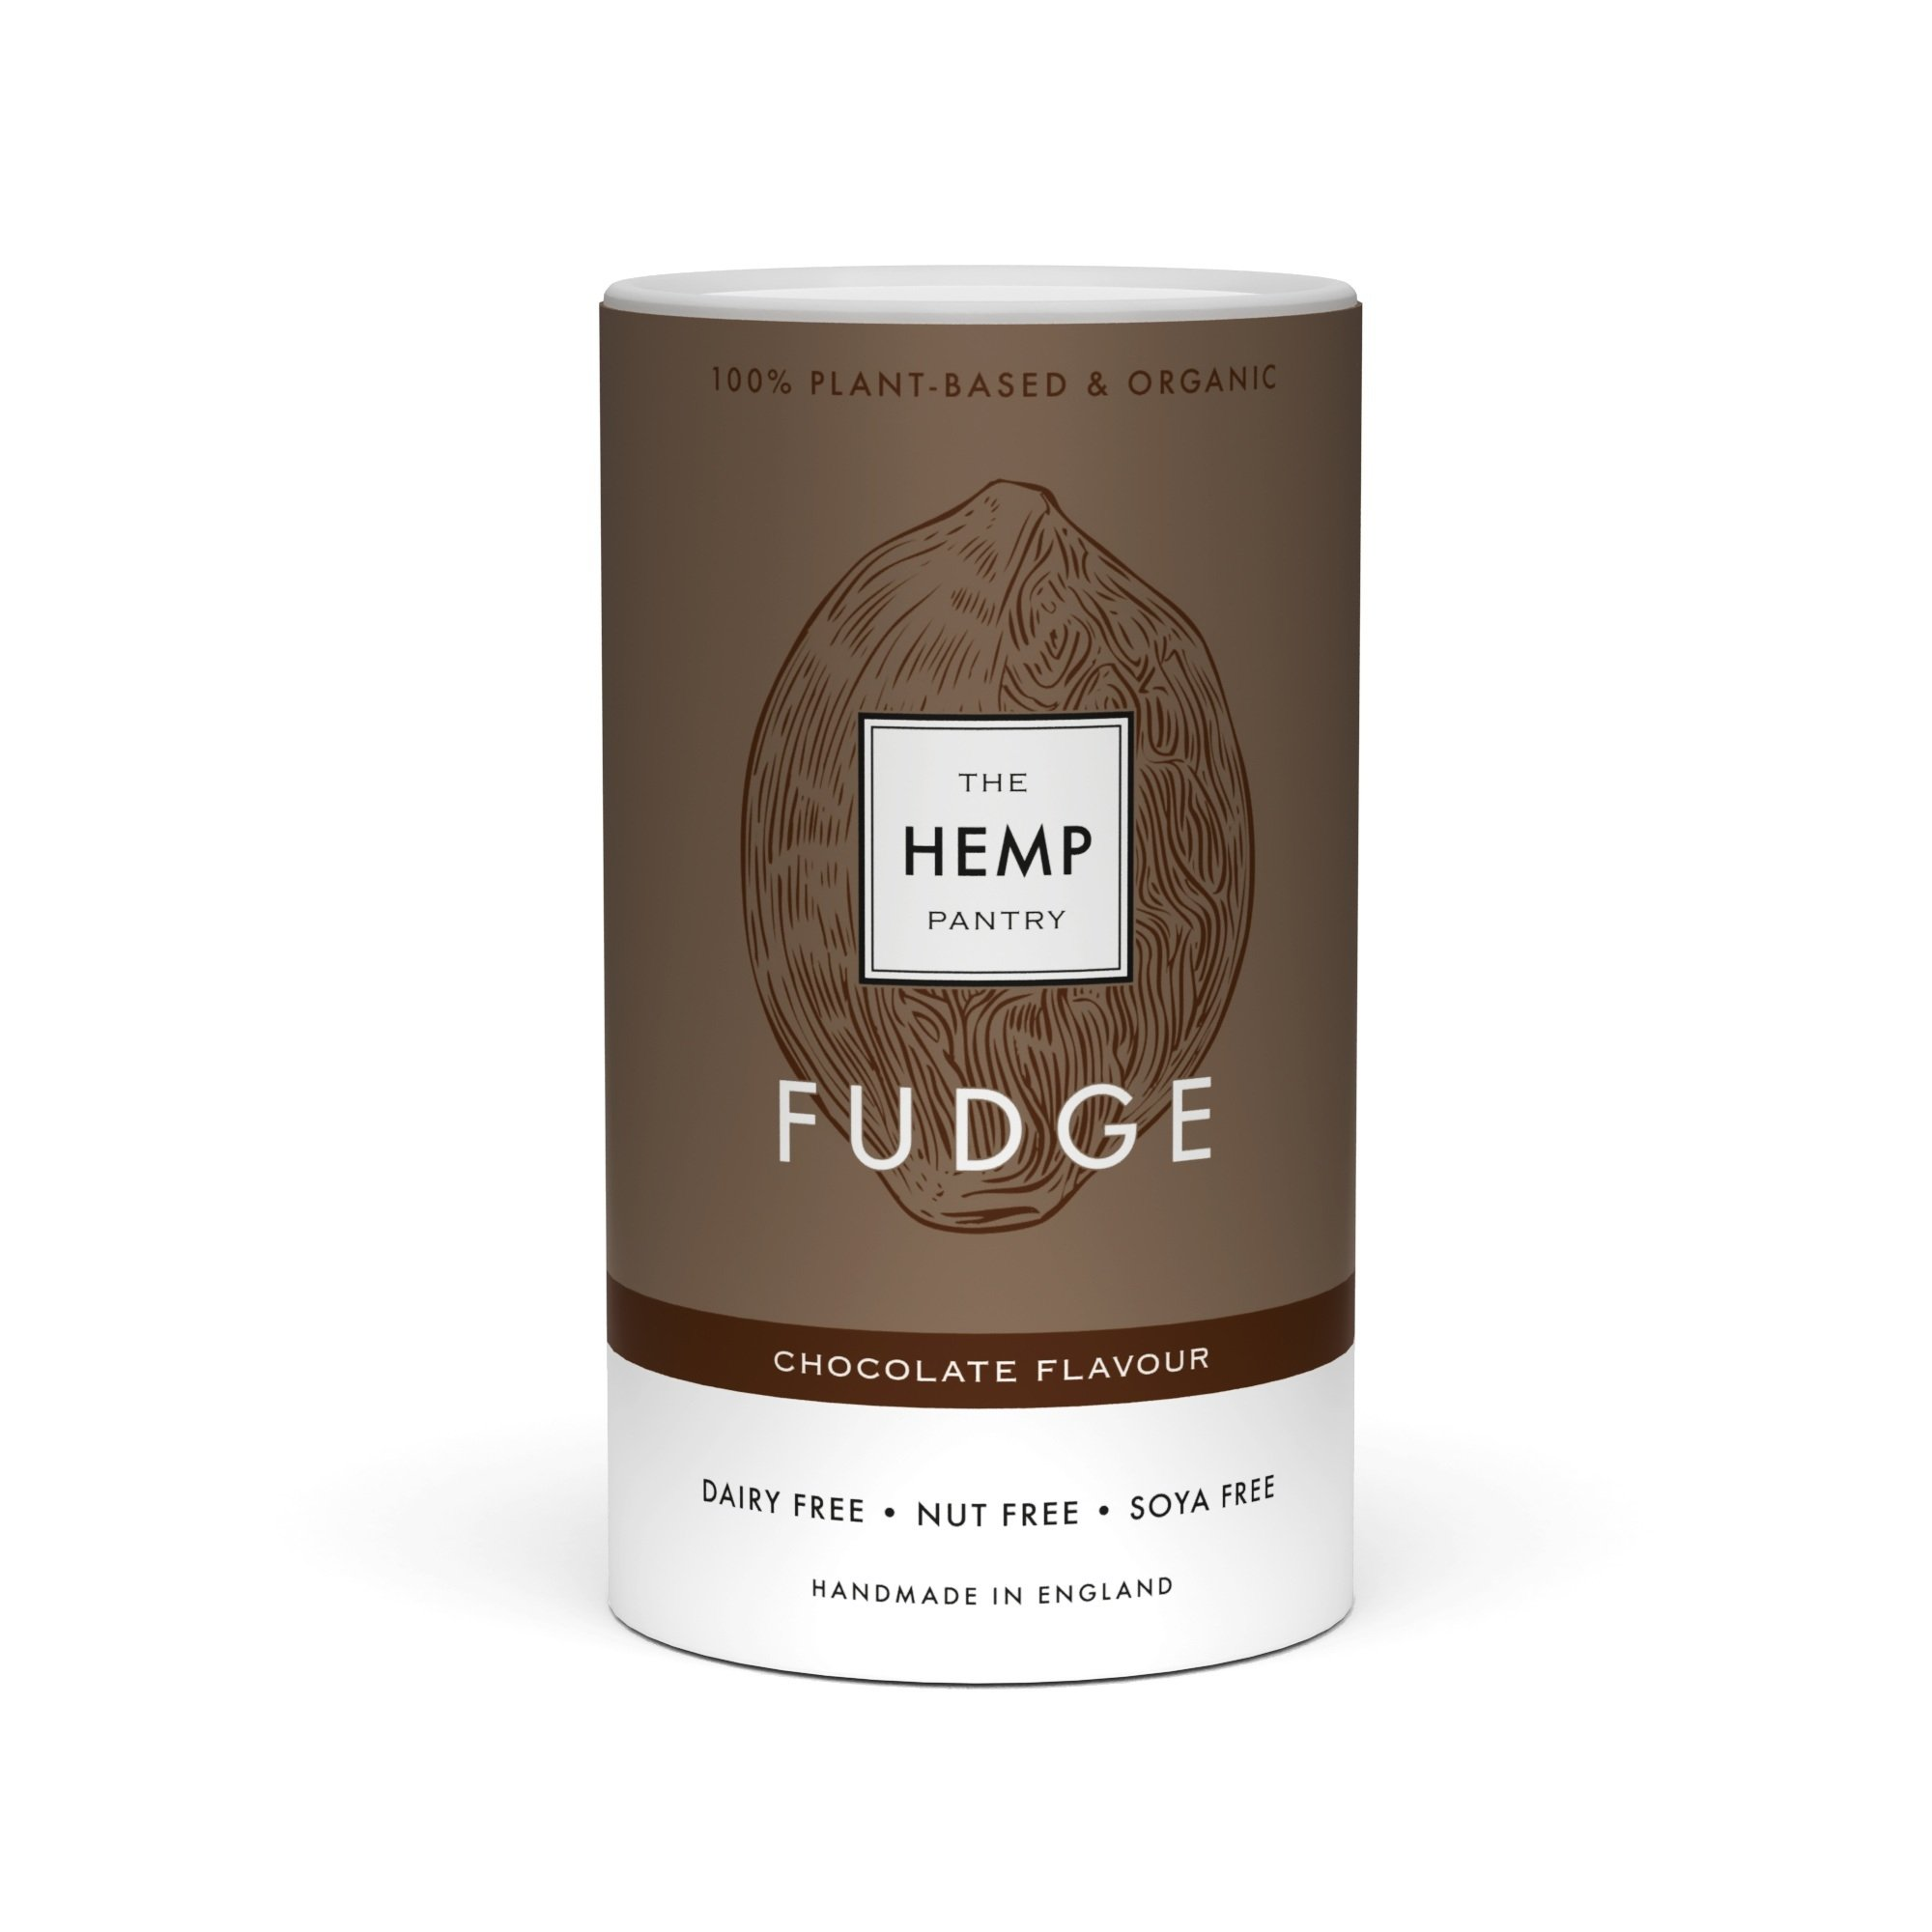 Organic Vegan Chocolate Fudge 175g Kind Shop